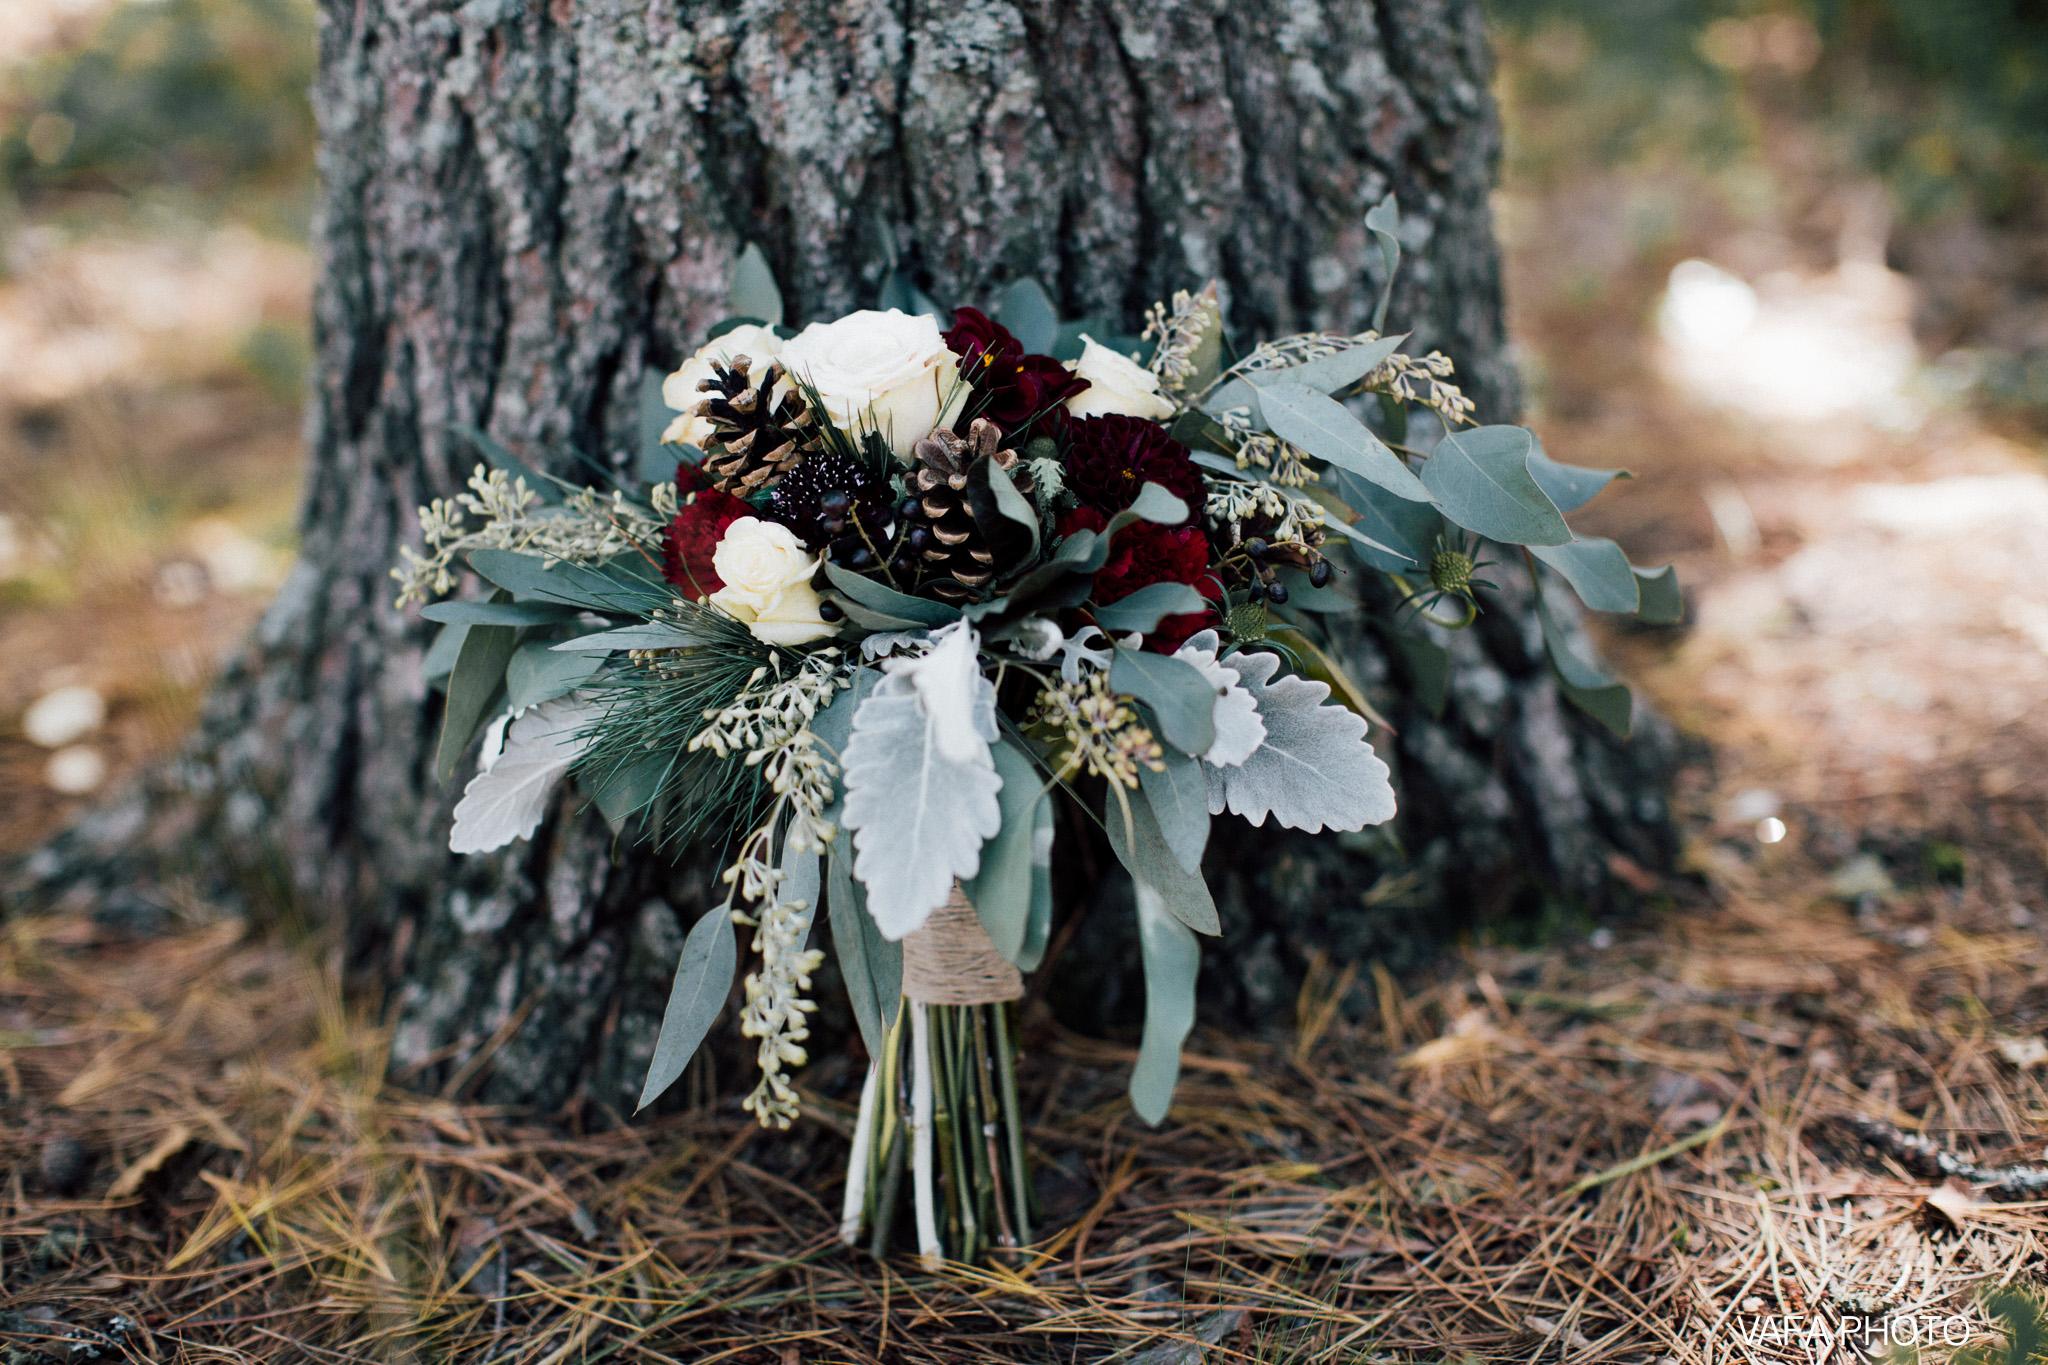 Hogback-Mountain-Wedding-Chelsea-Josh-Vafa-Photo-670.jpg